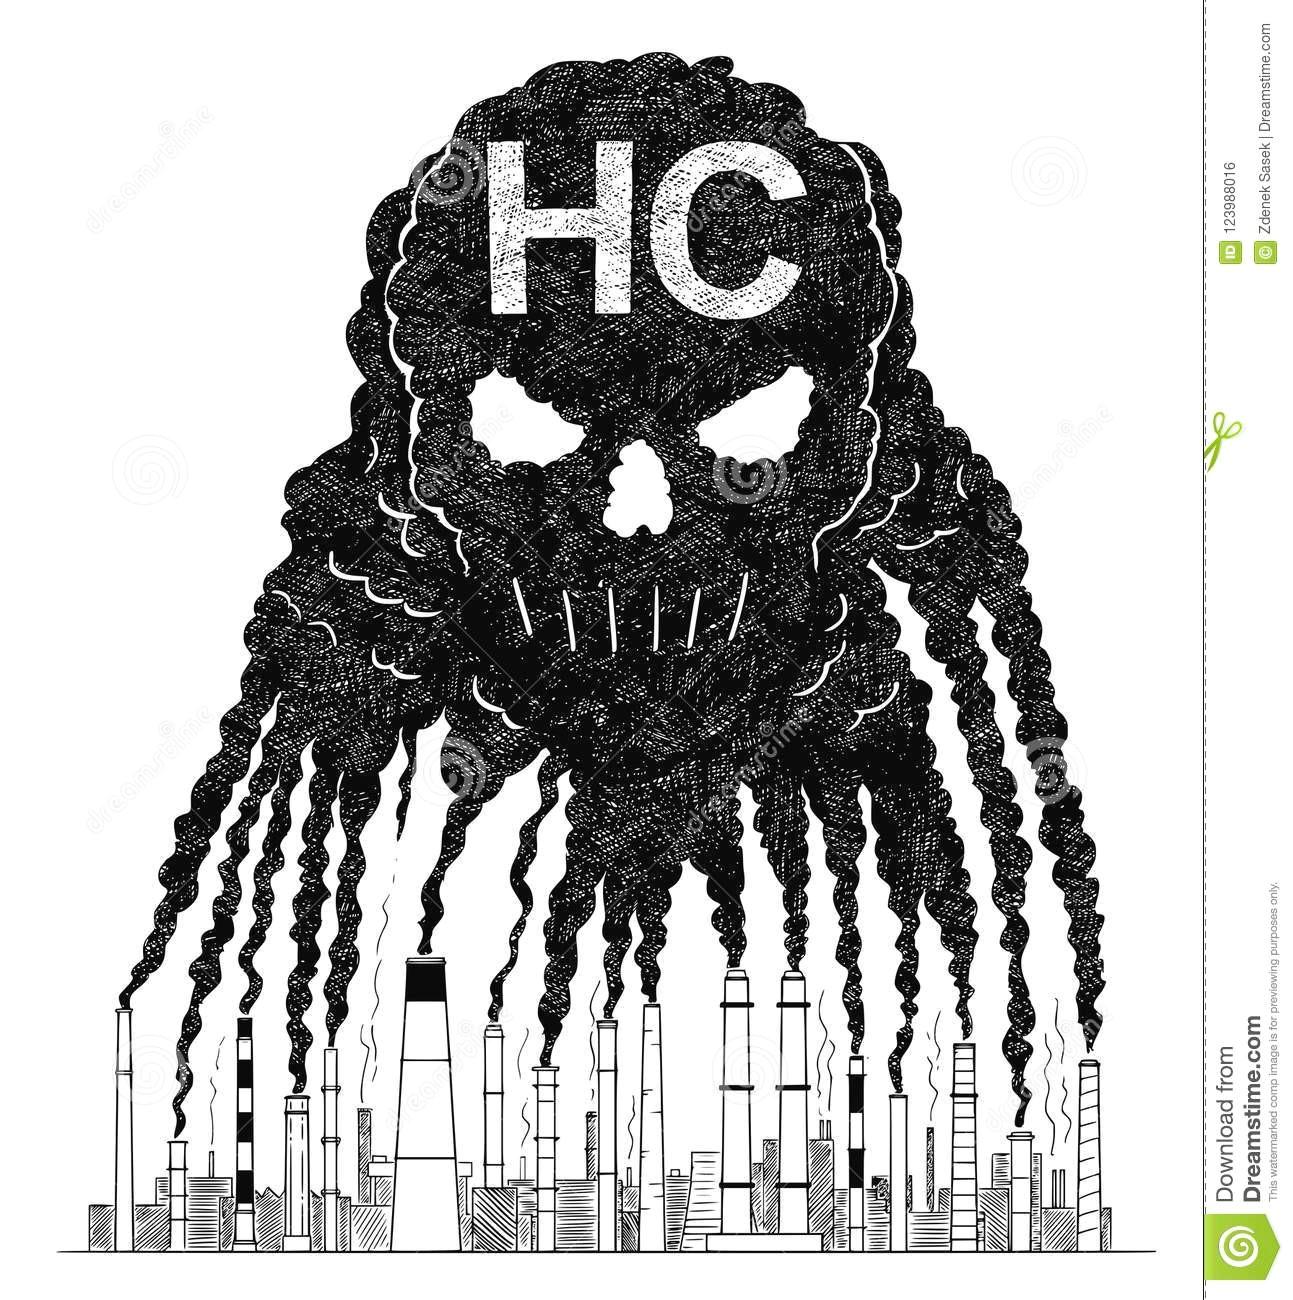 vector artistic drawing illustration of smoke from smokestacks creating human skull concept of hc air